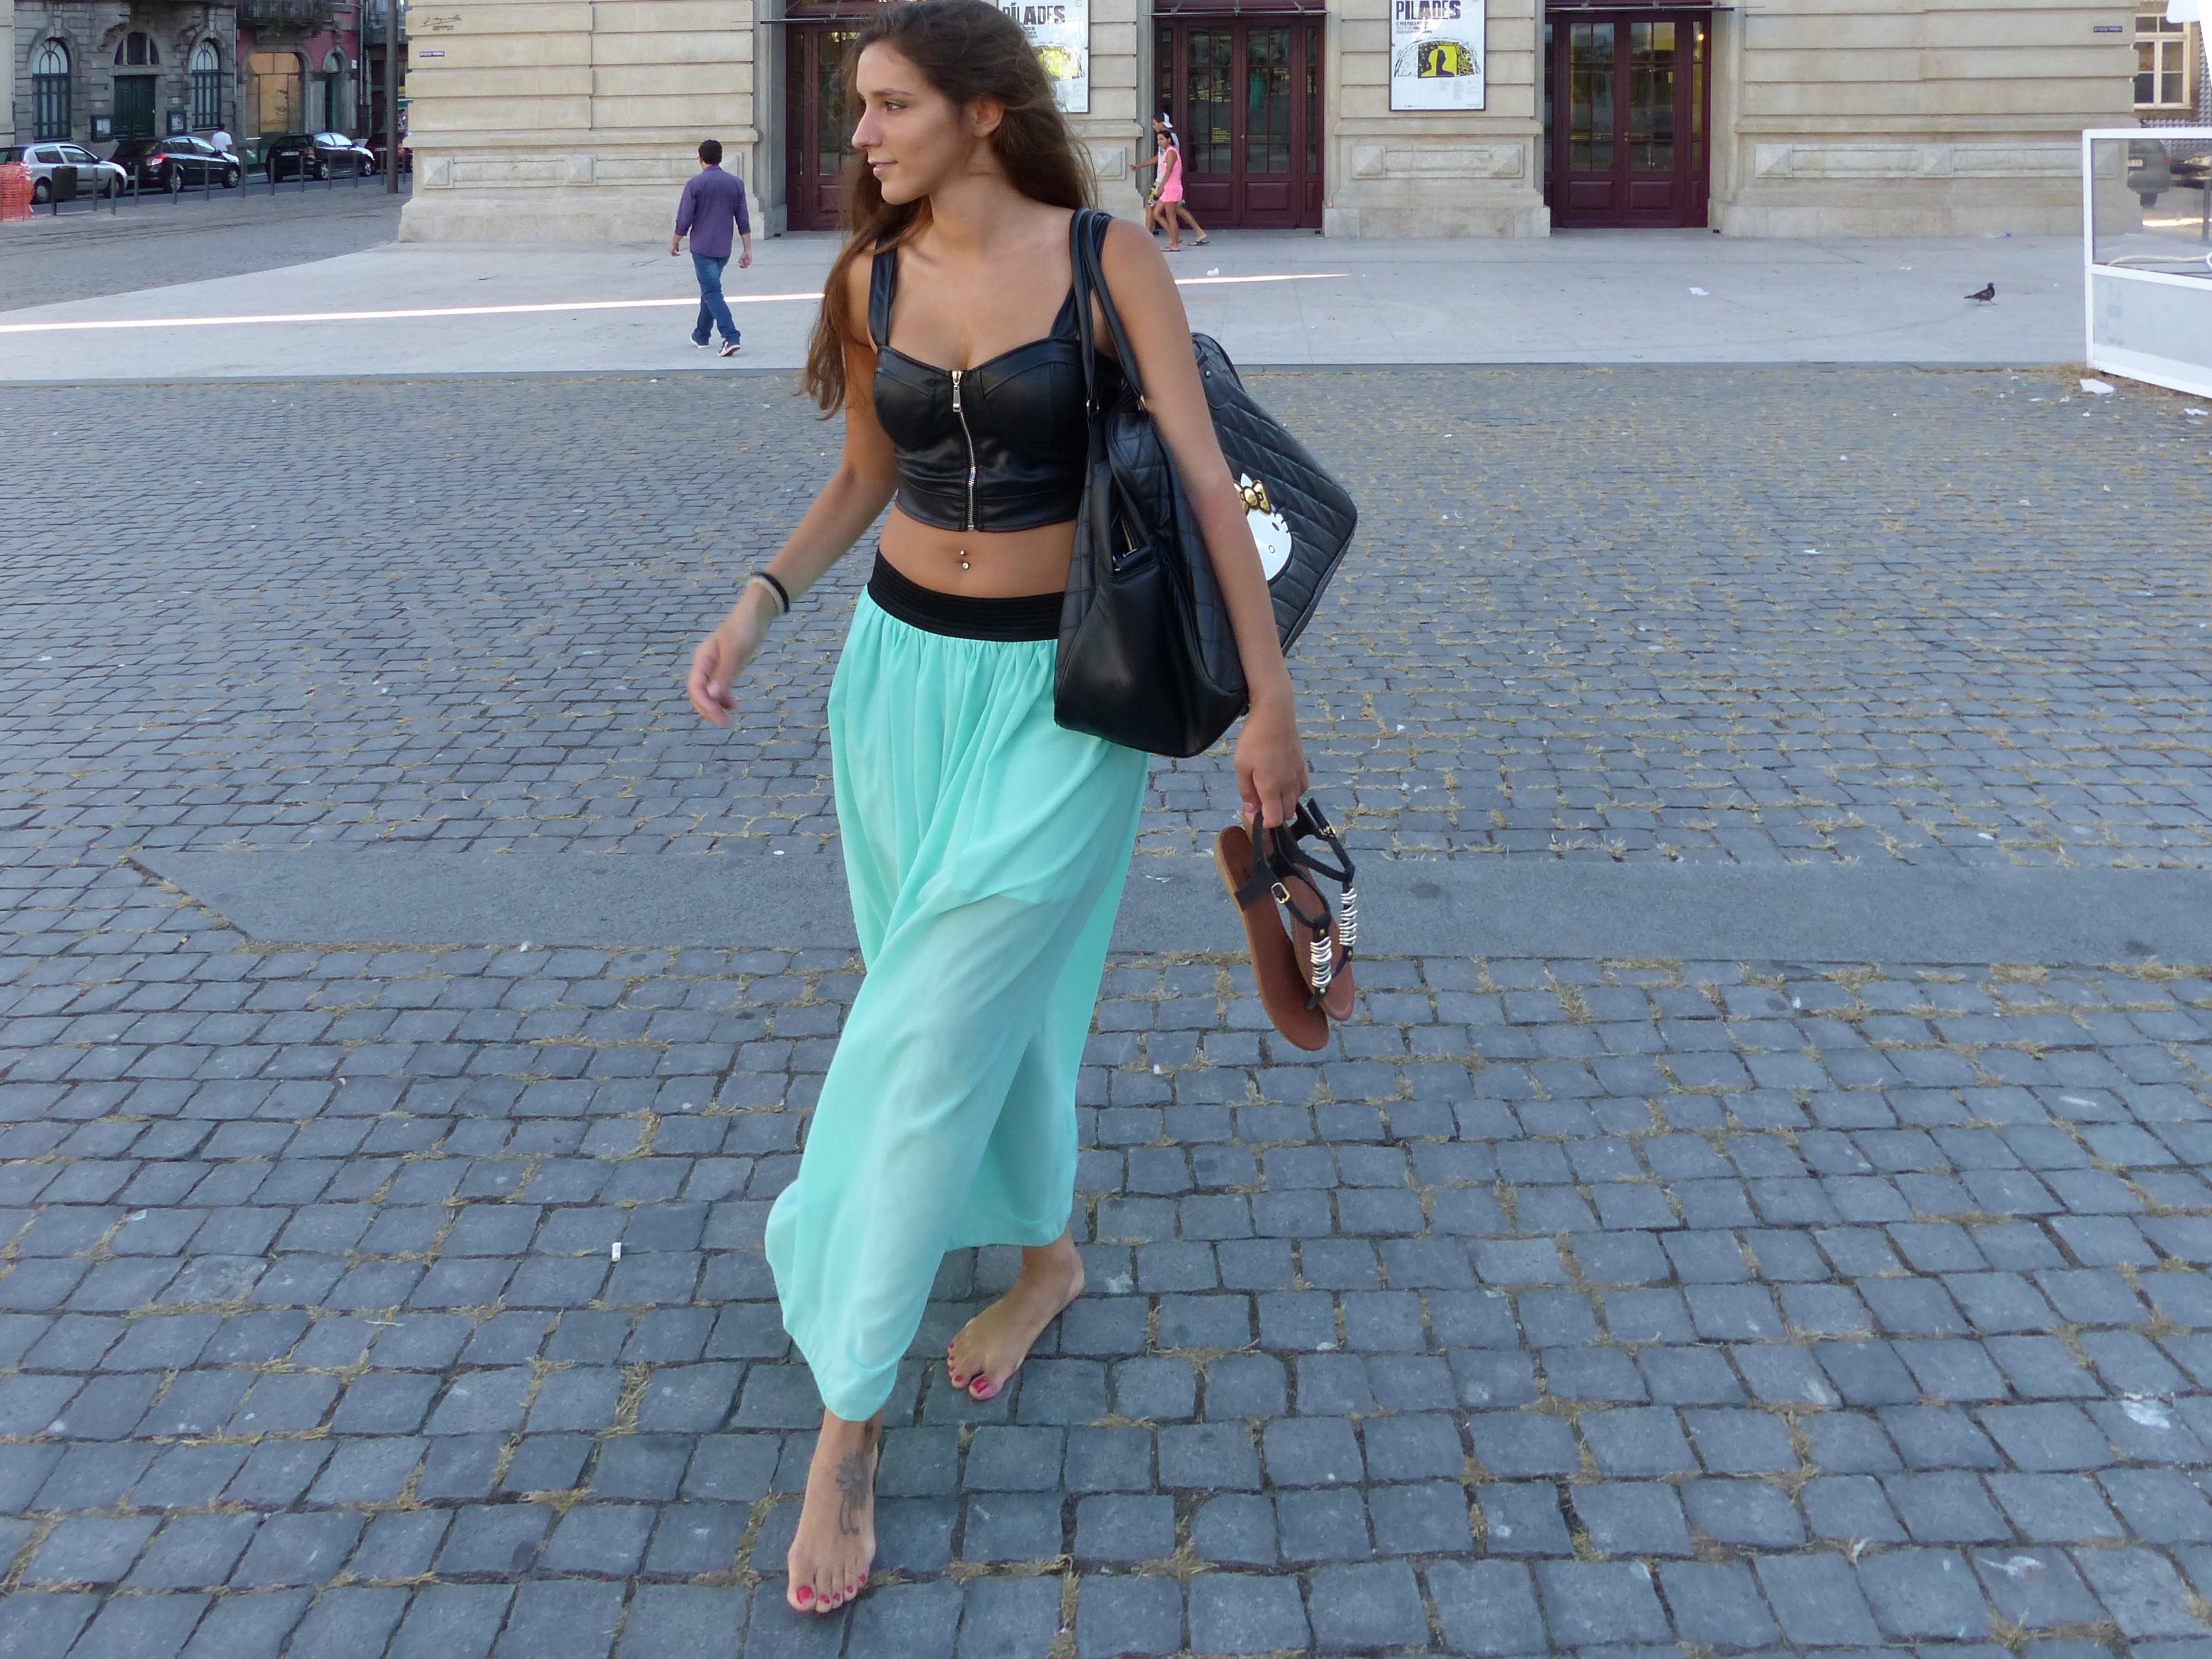 https://get.wallhere.com/photo/barefoot-dress-blue-fashion-spring-clothing-Portugal-Porto-beauty-lady-leg-costume-barefeet-footwear-oporto-photo-shoot-photomodel-descal-a-descalza-barefootbeauty-alicemargarida-702746.jpg